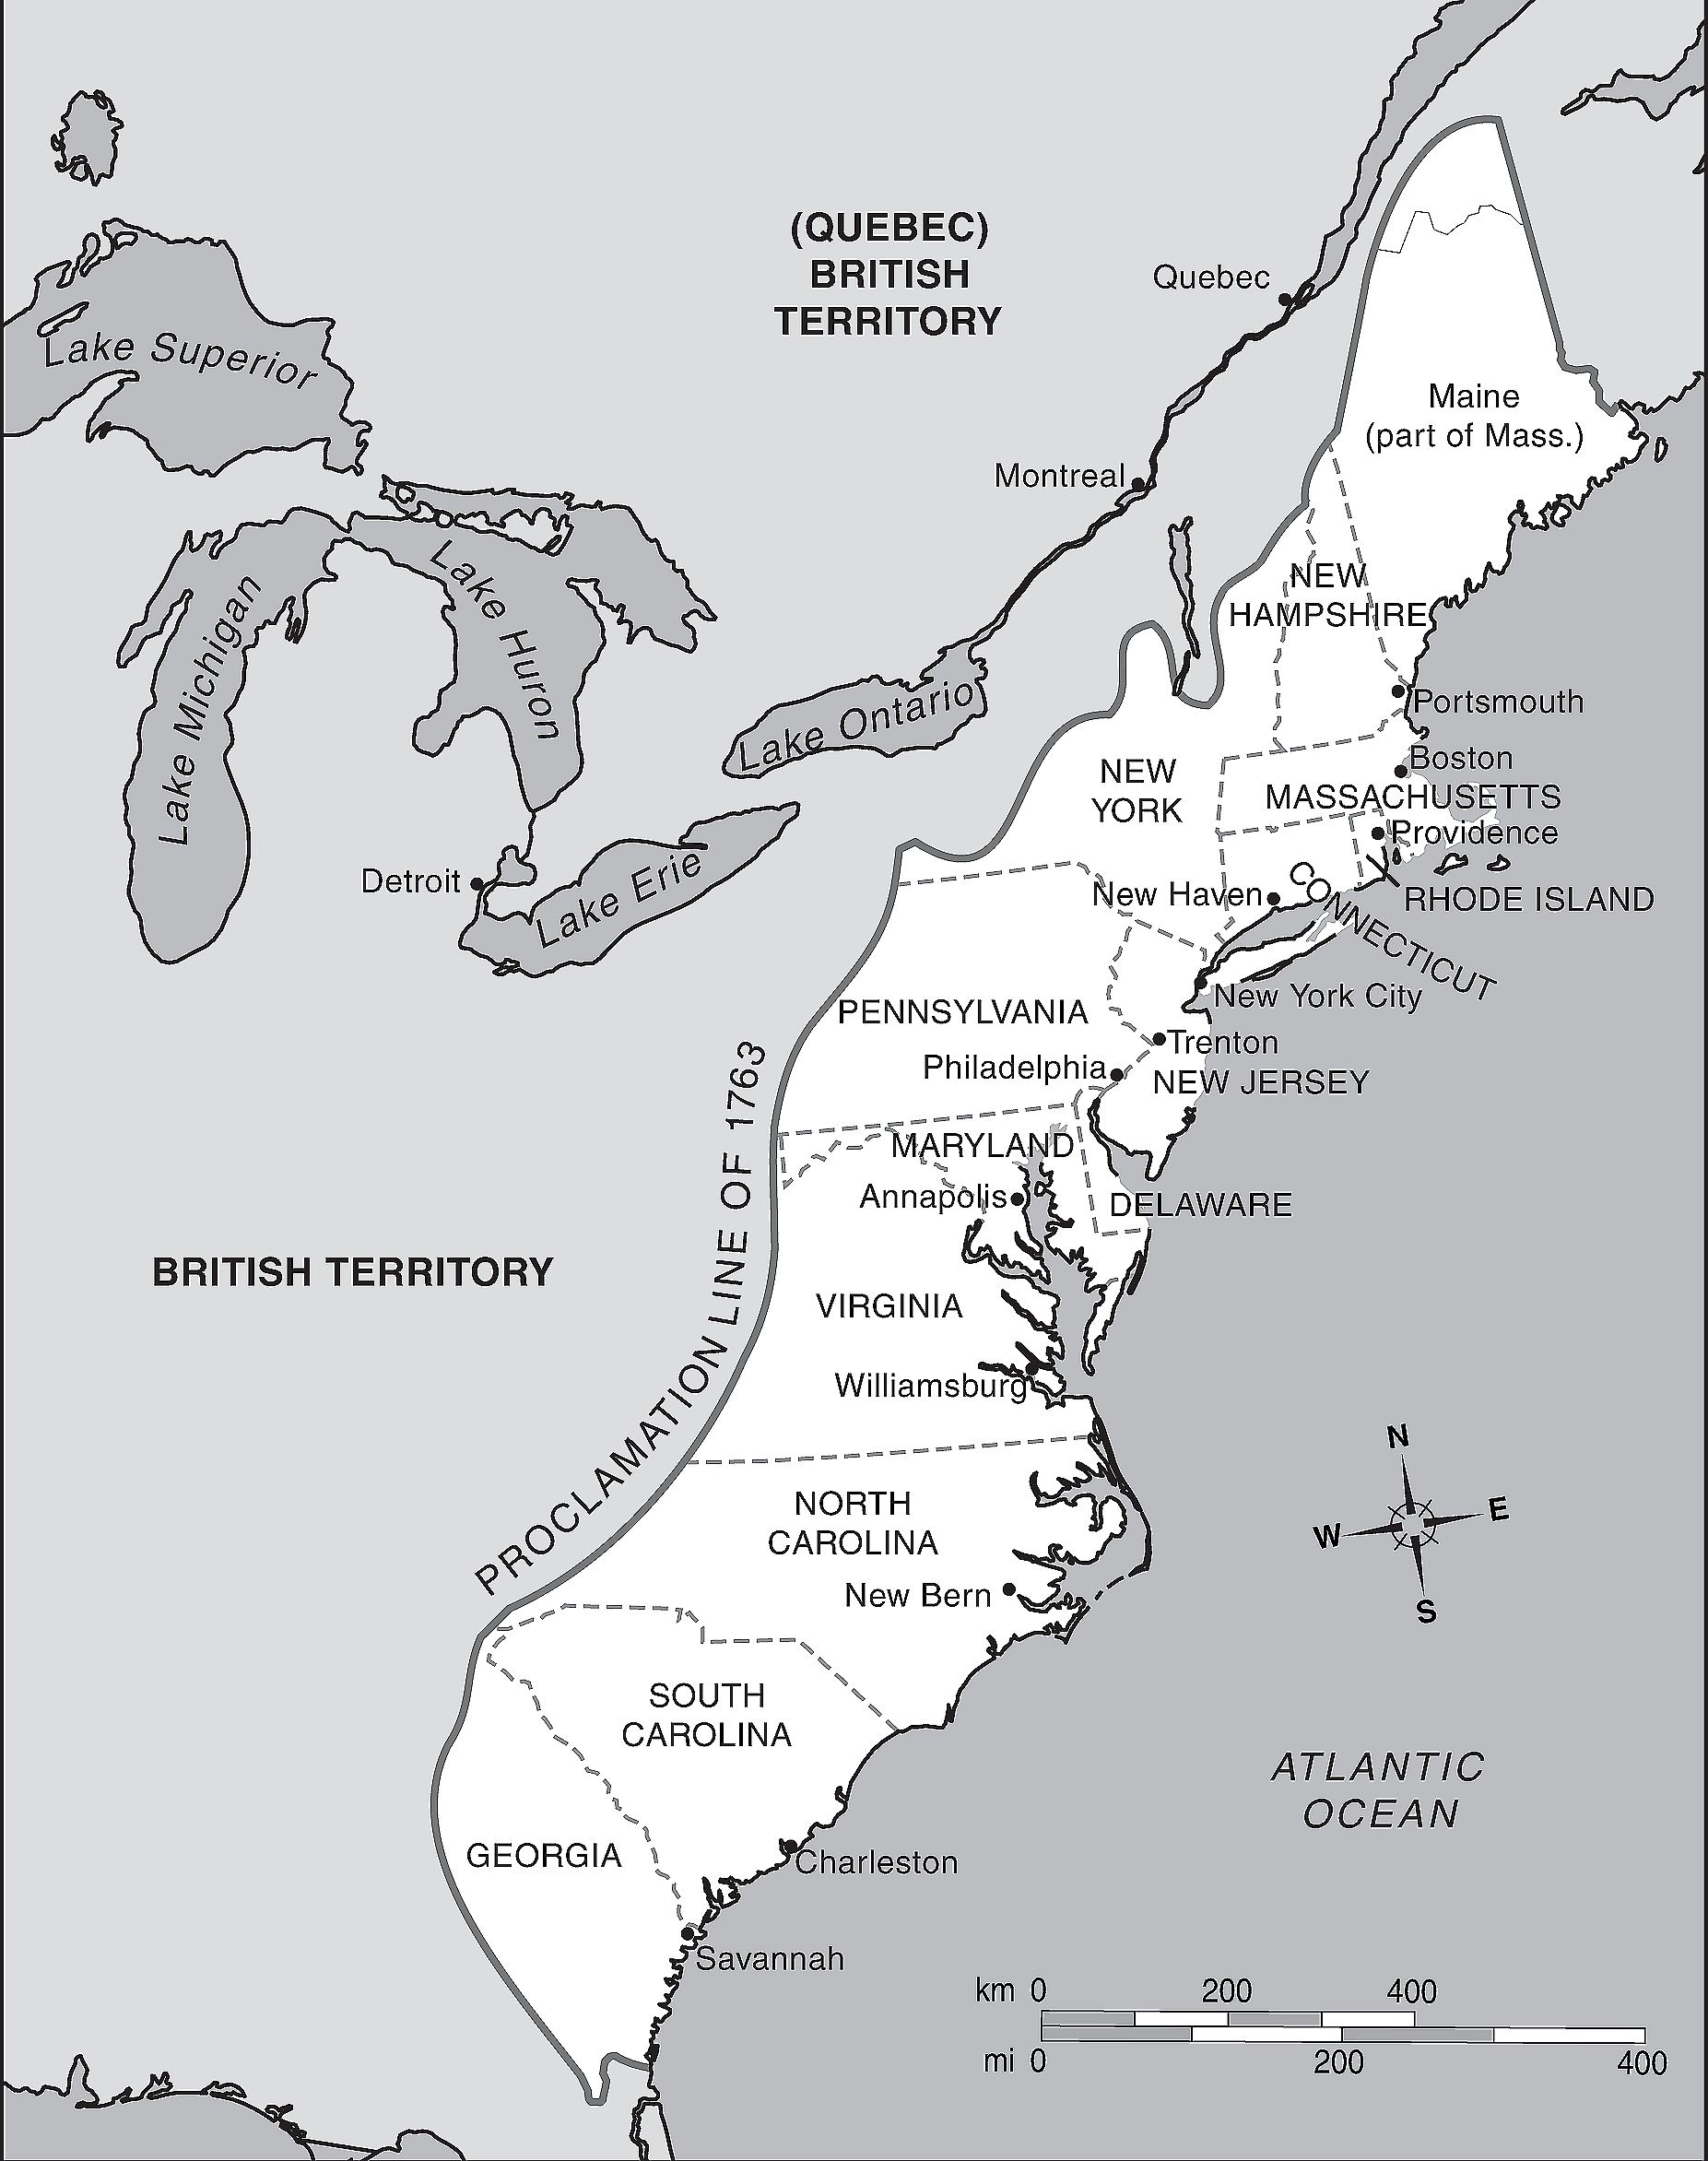 medium resolution of The Thirteen Colonies Worksheet   Printable Worksheets and Activities for  Teachers